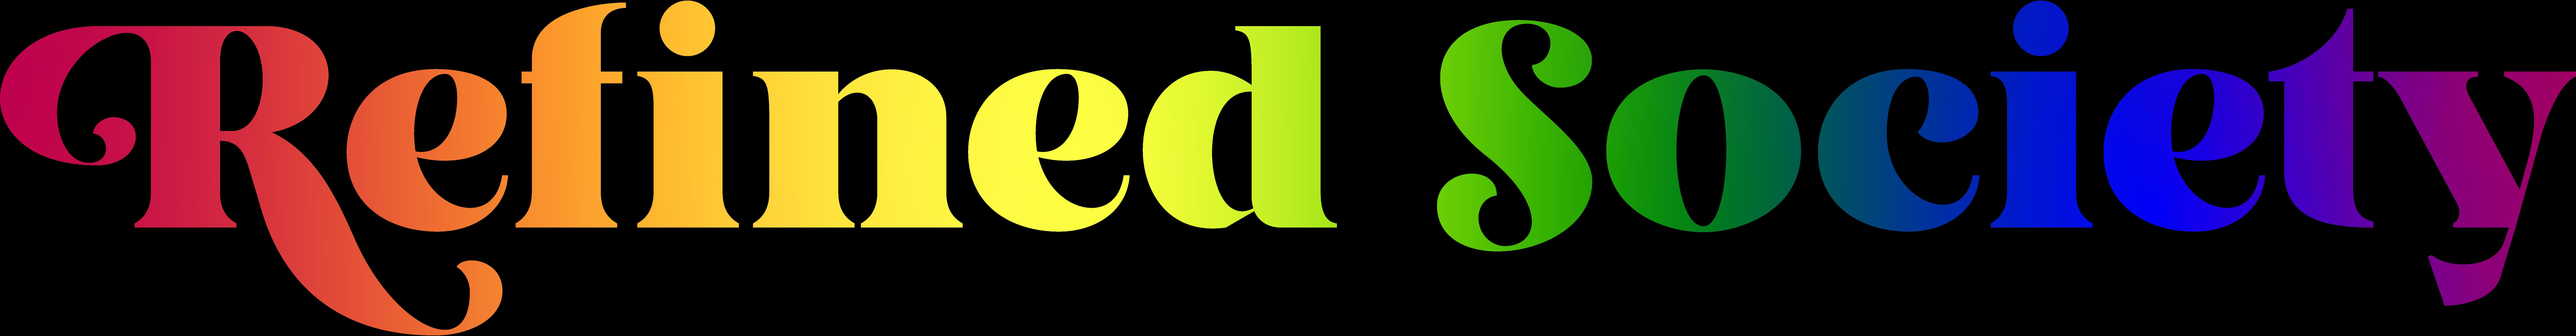 RS Pride logo